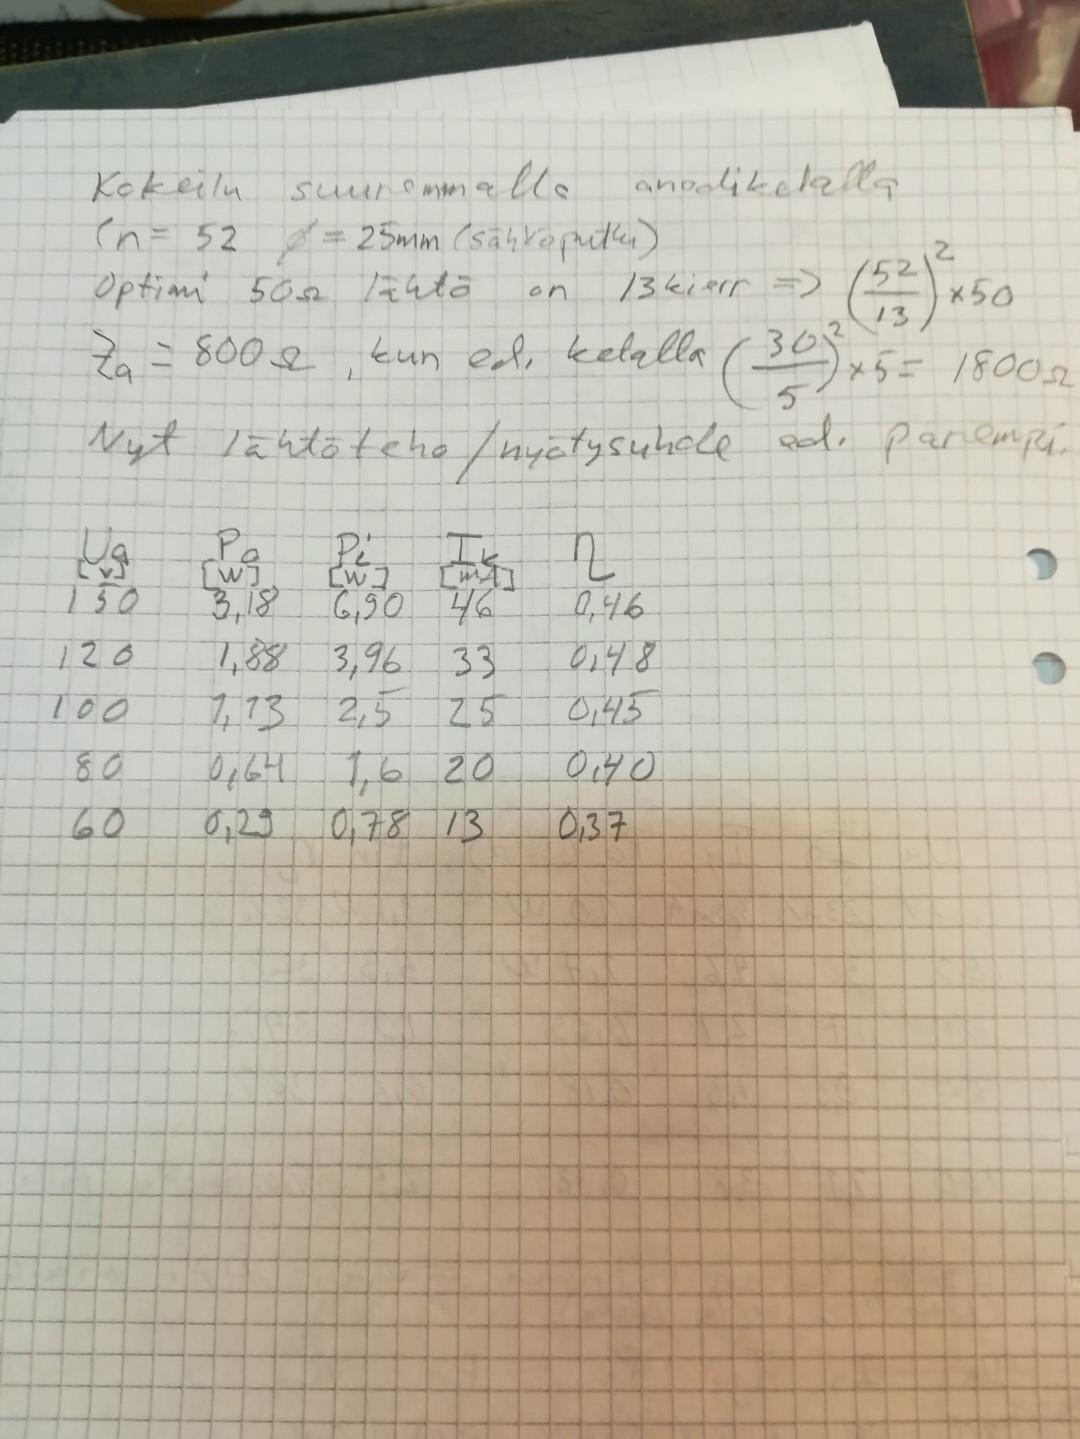 1P24B_xtal_2__Large_.jpg